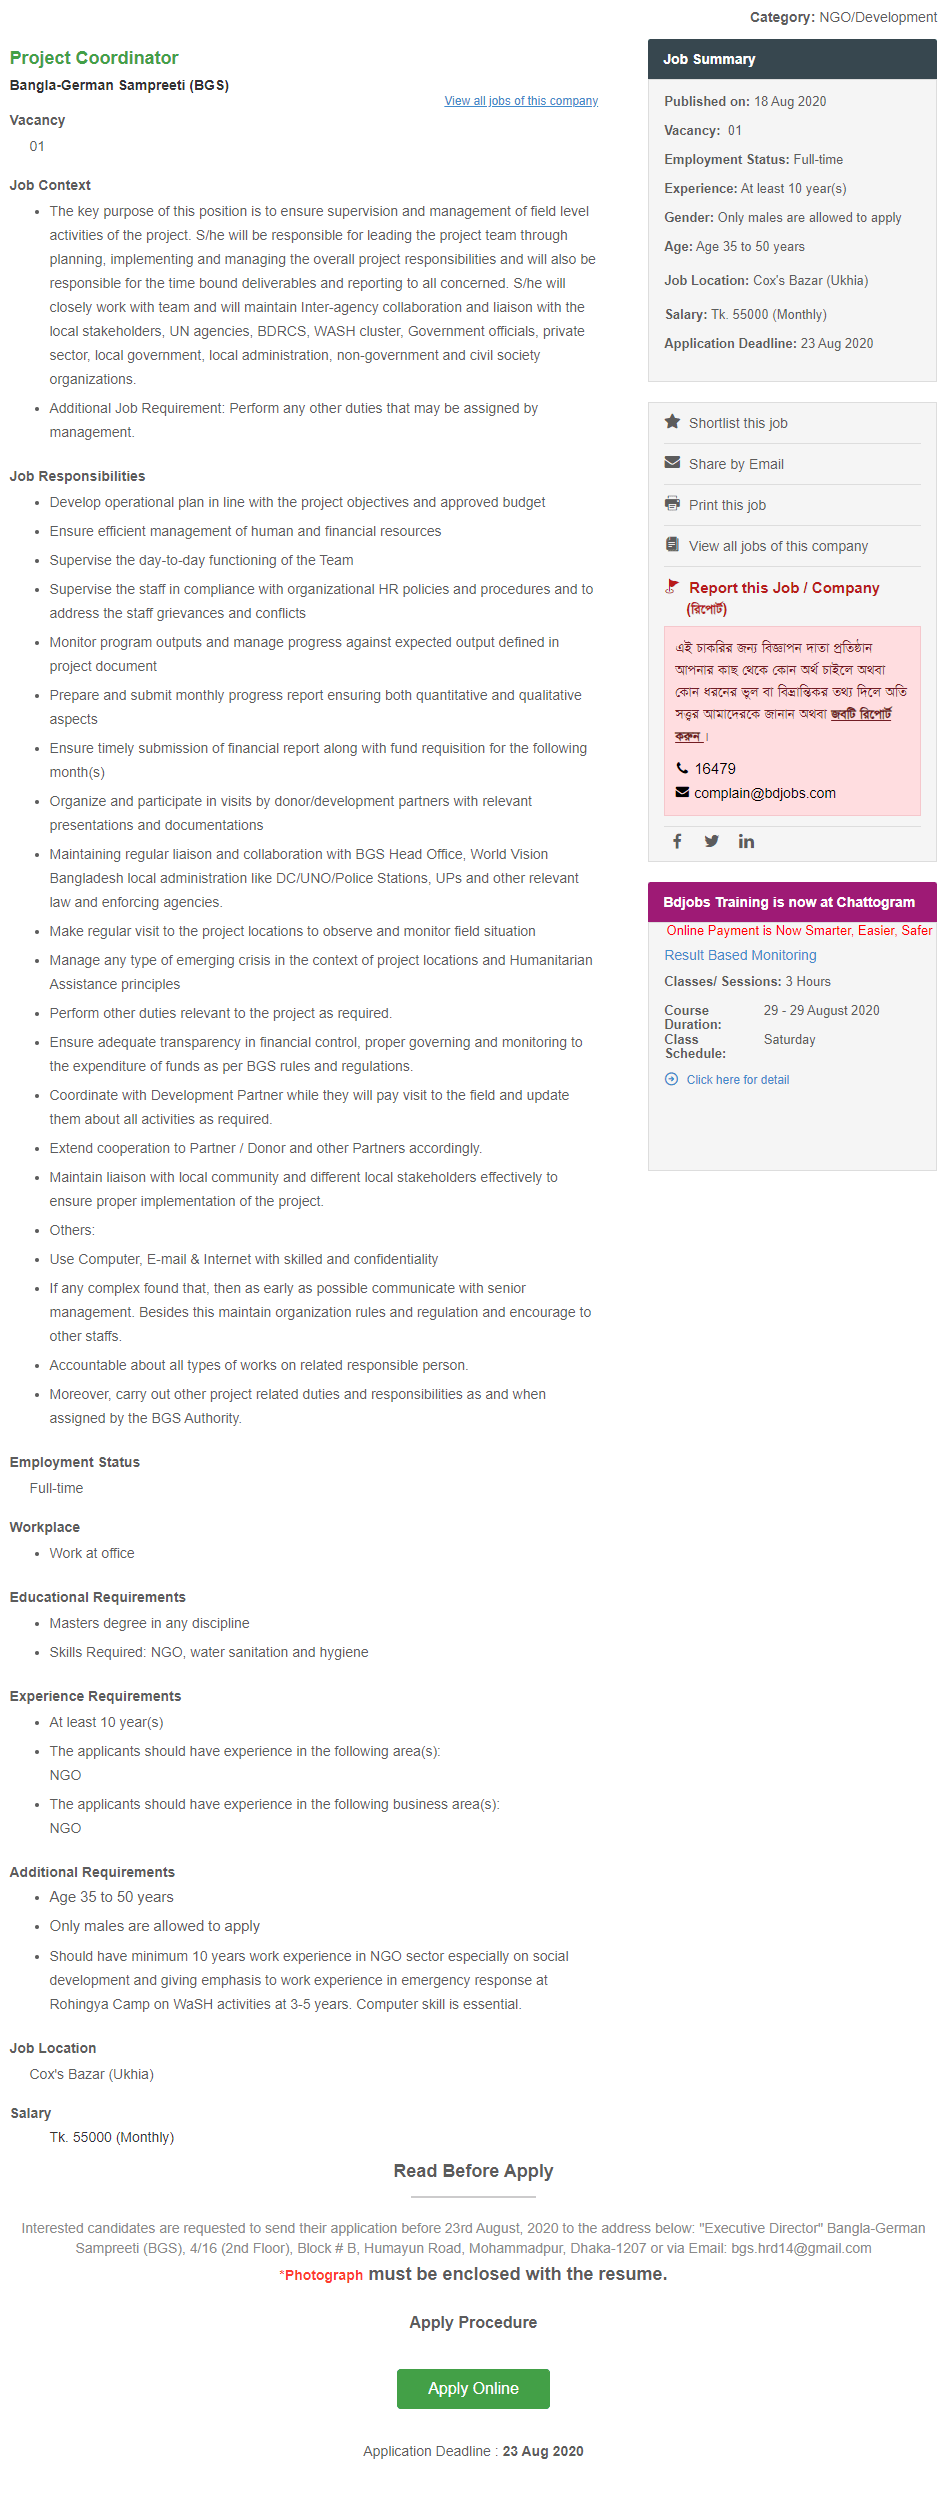 BGS Job Circular 2020